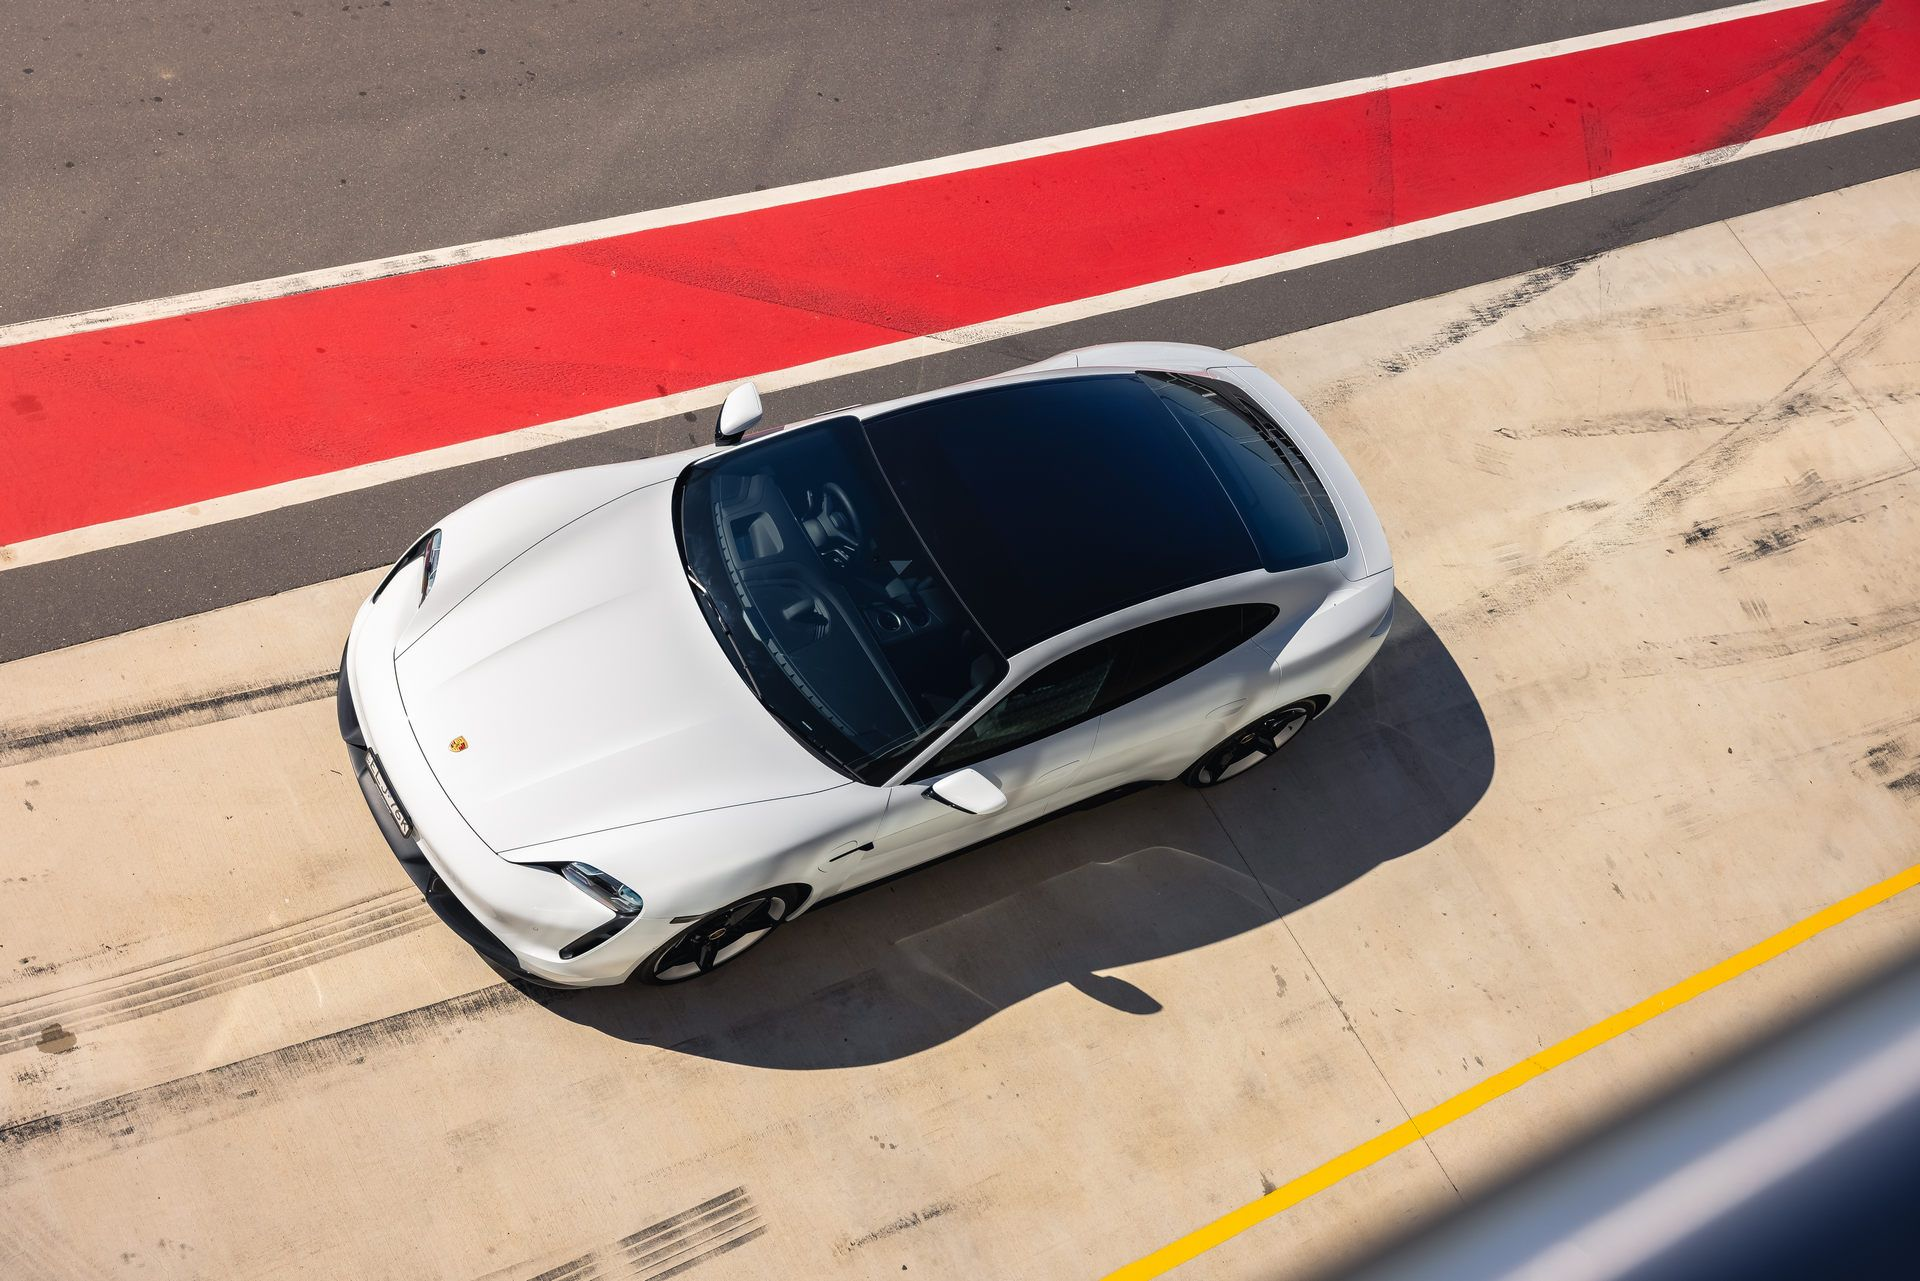 Porsche-Taycan-Turbo-S-The-Bend-Motorsport-Park-41